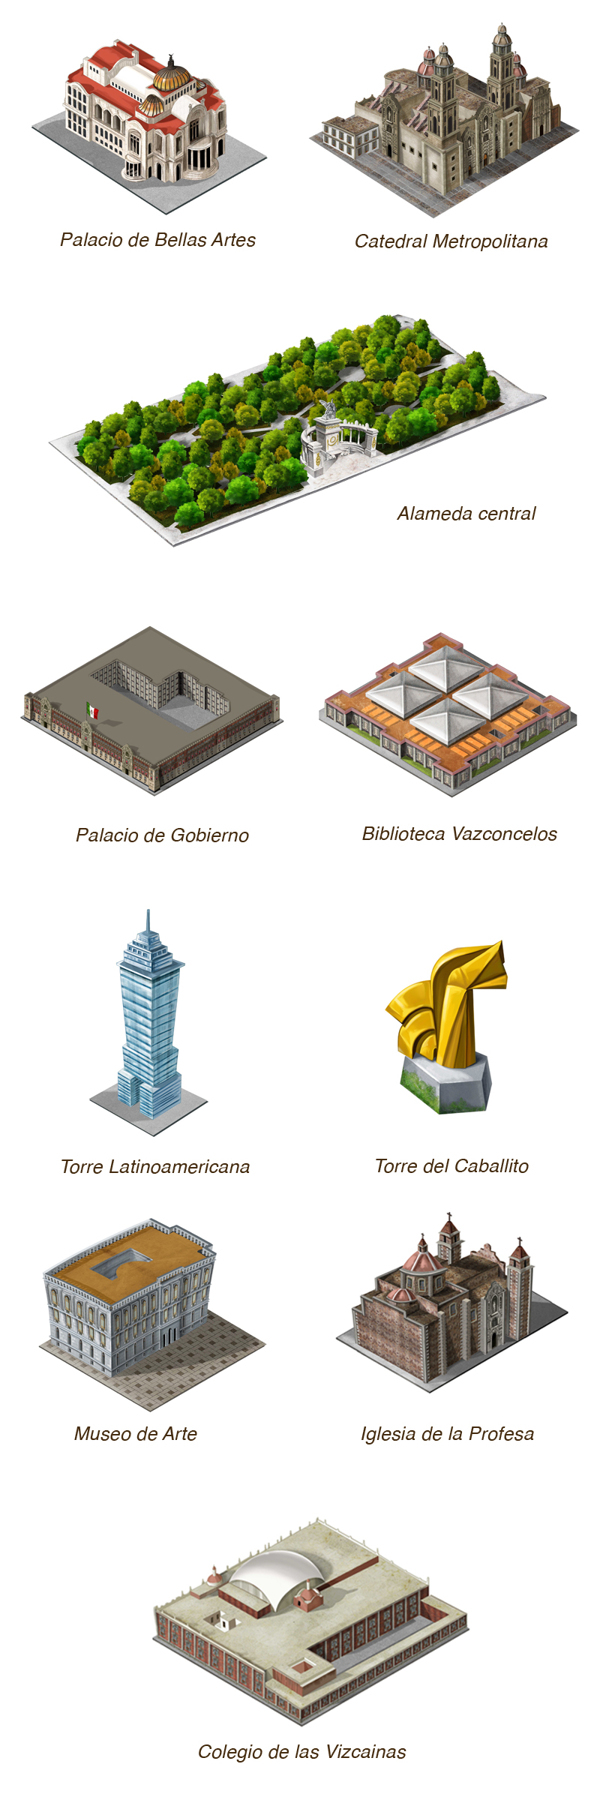 Mapa sanborns on behance for Sanborns los azulejos direccion